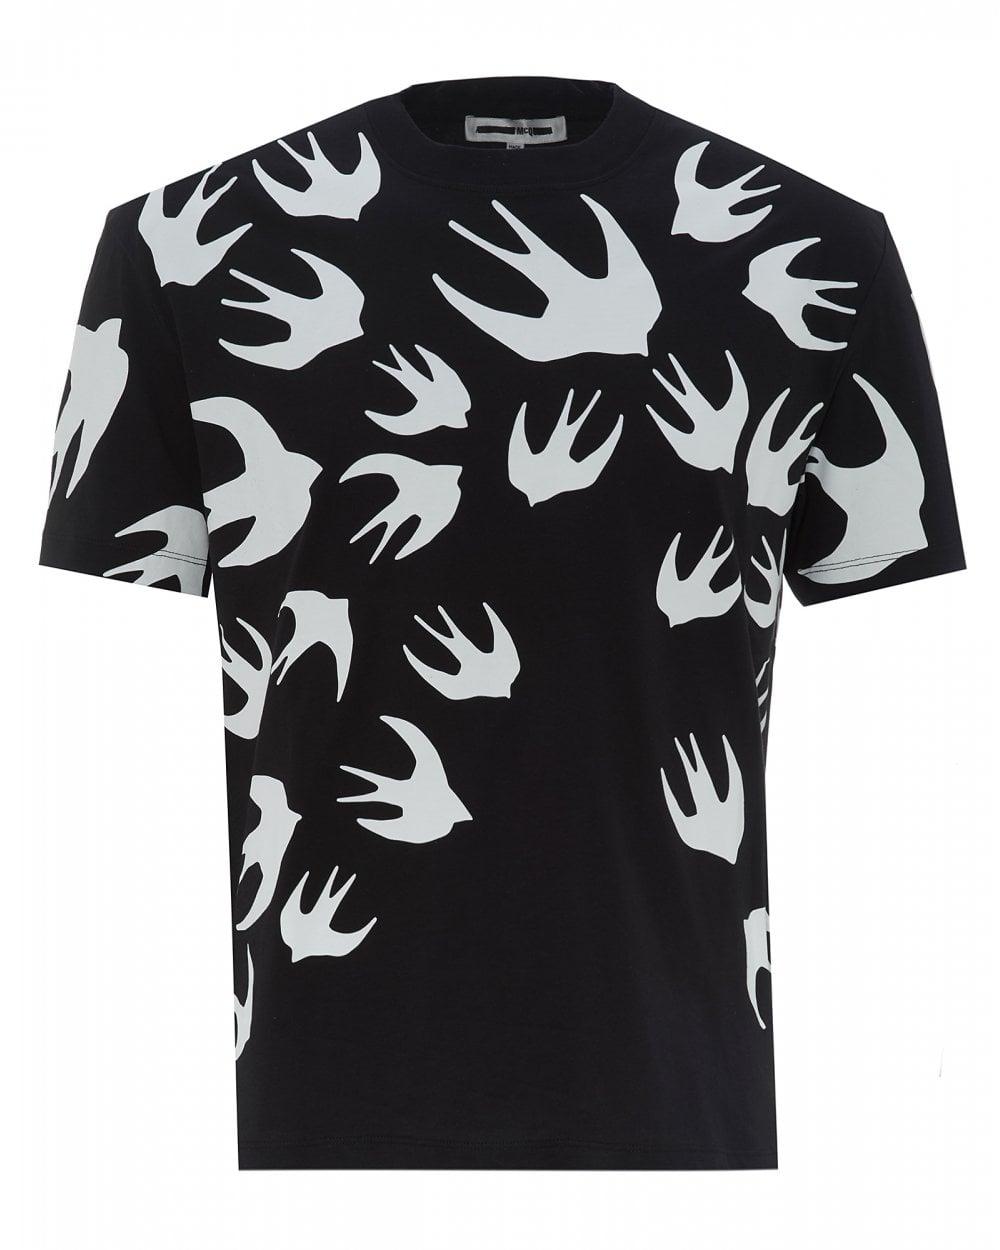 445e34e2386 McQ by Alexander McQueen Mens Large Swallow T-Shirt